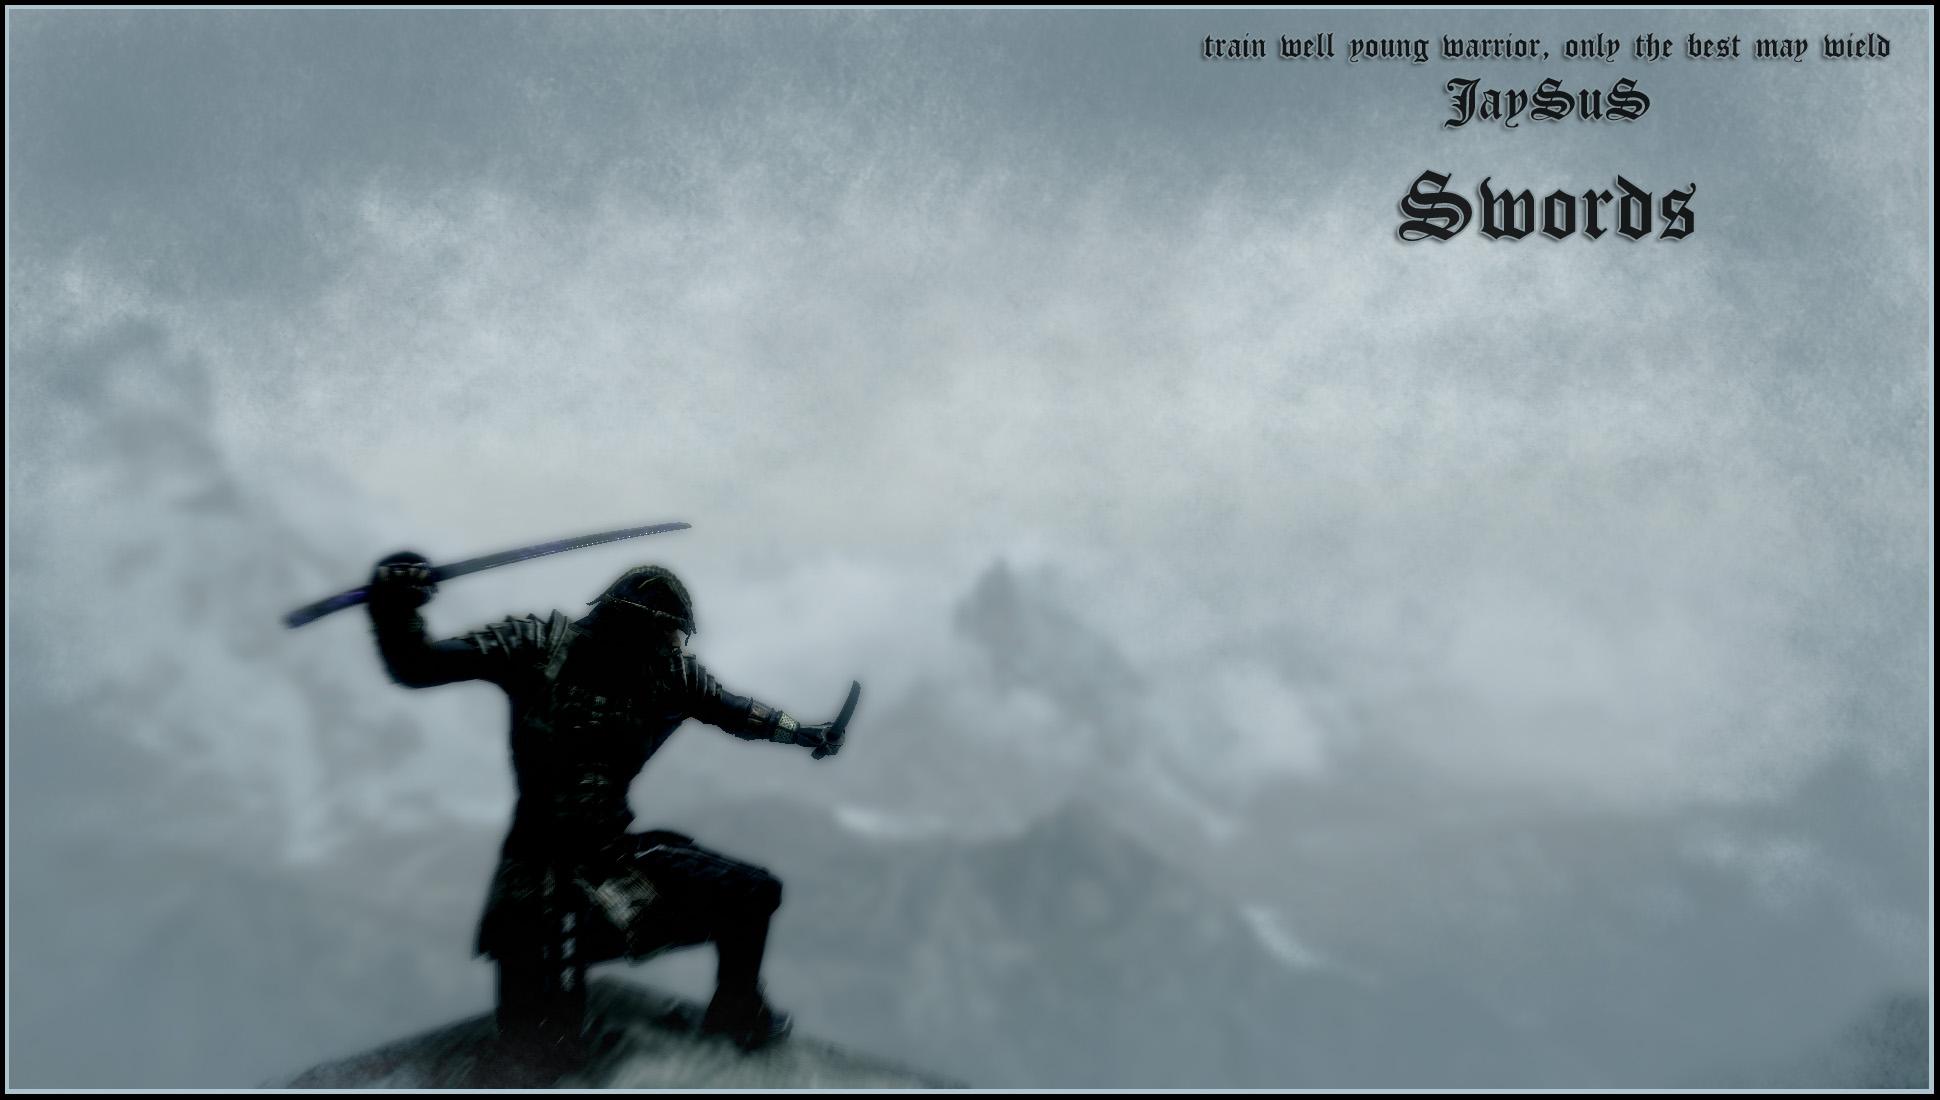 JaySUS Swords | The Elder Scrolls Mods Wiki | FANDOM powered by Wikia